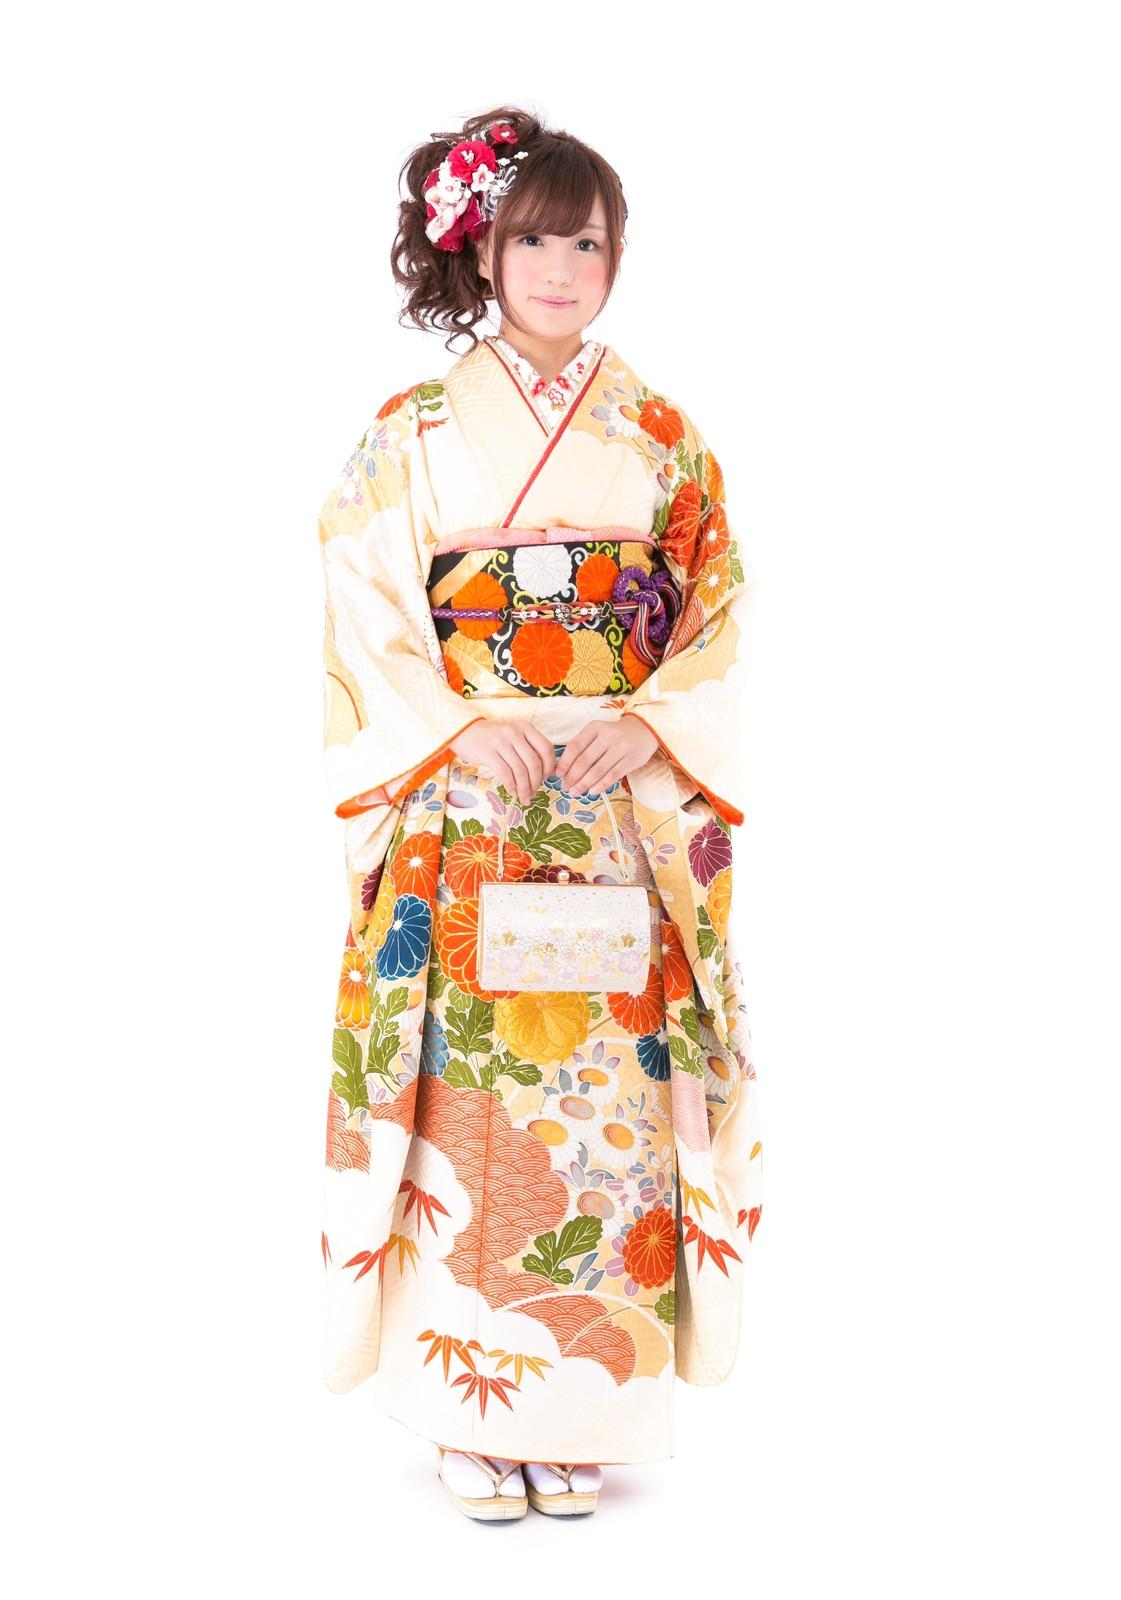 20161216-kimonoyuka0i9a7349-thumb-autox1600-26149.jpg